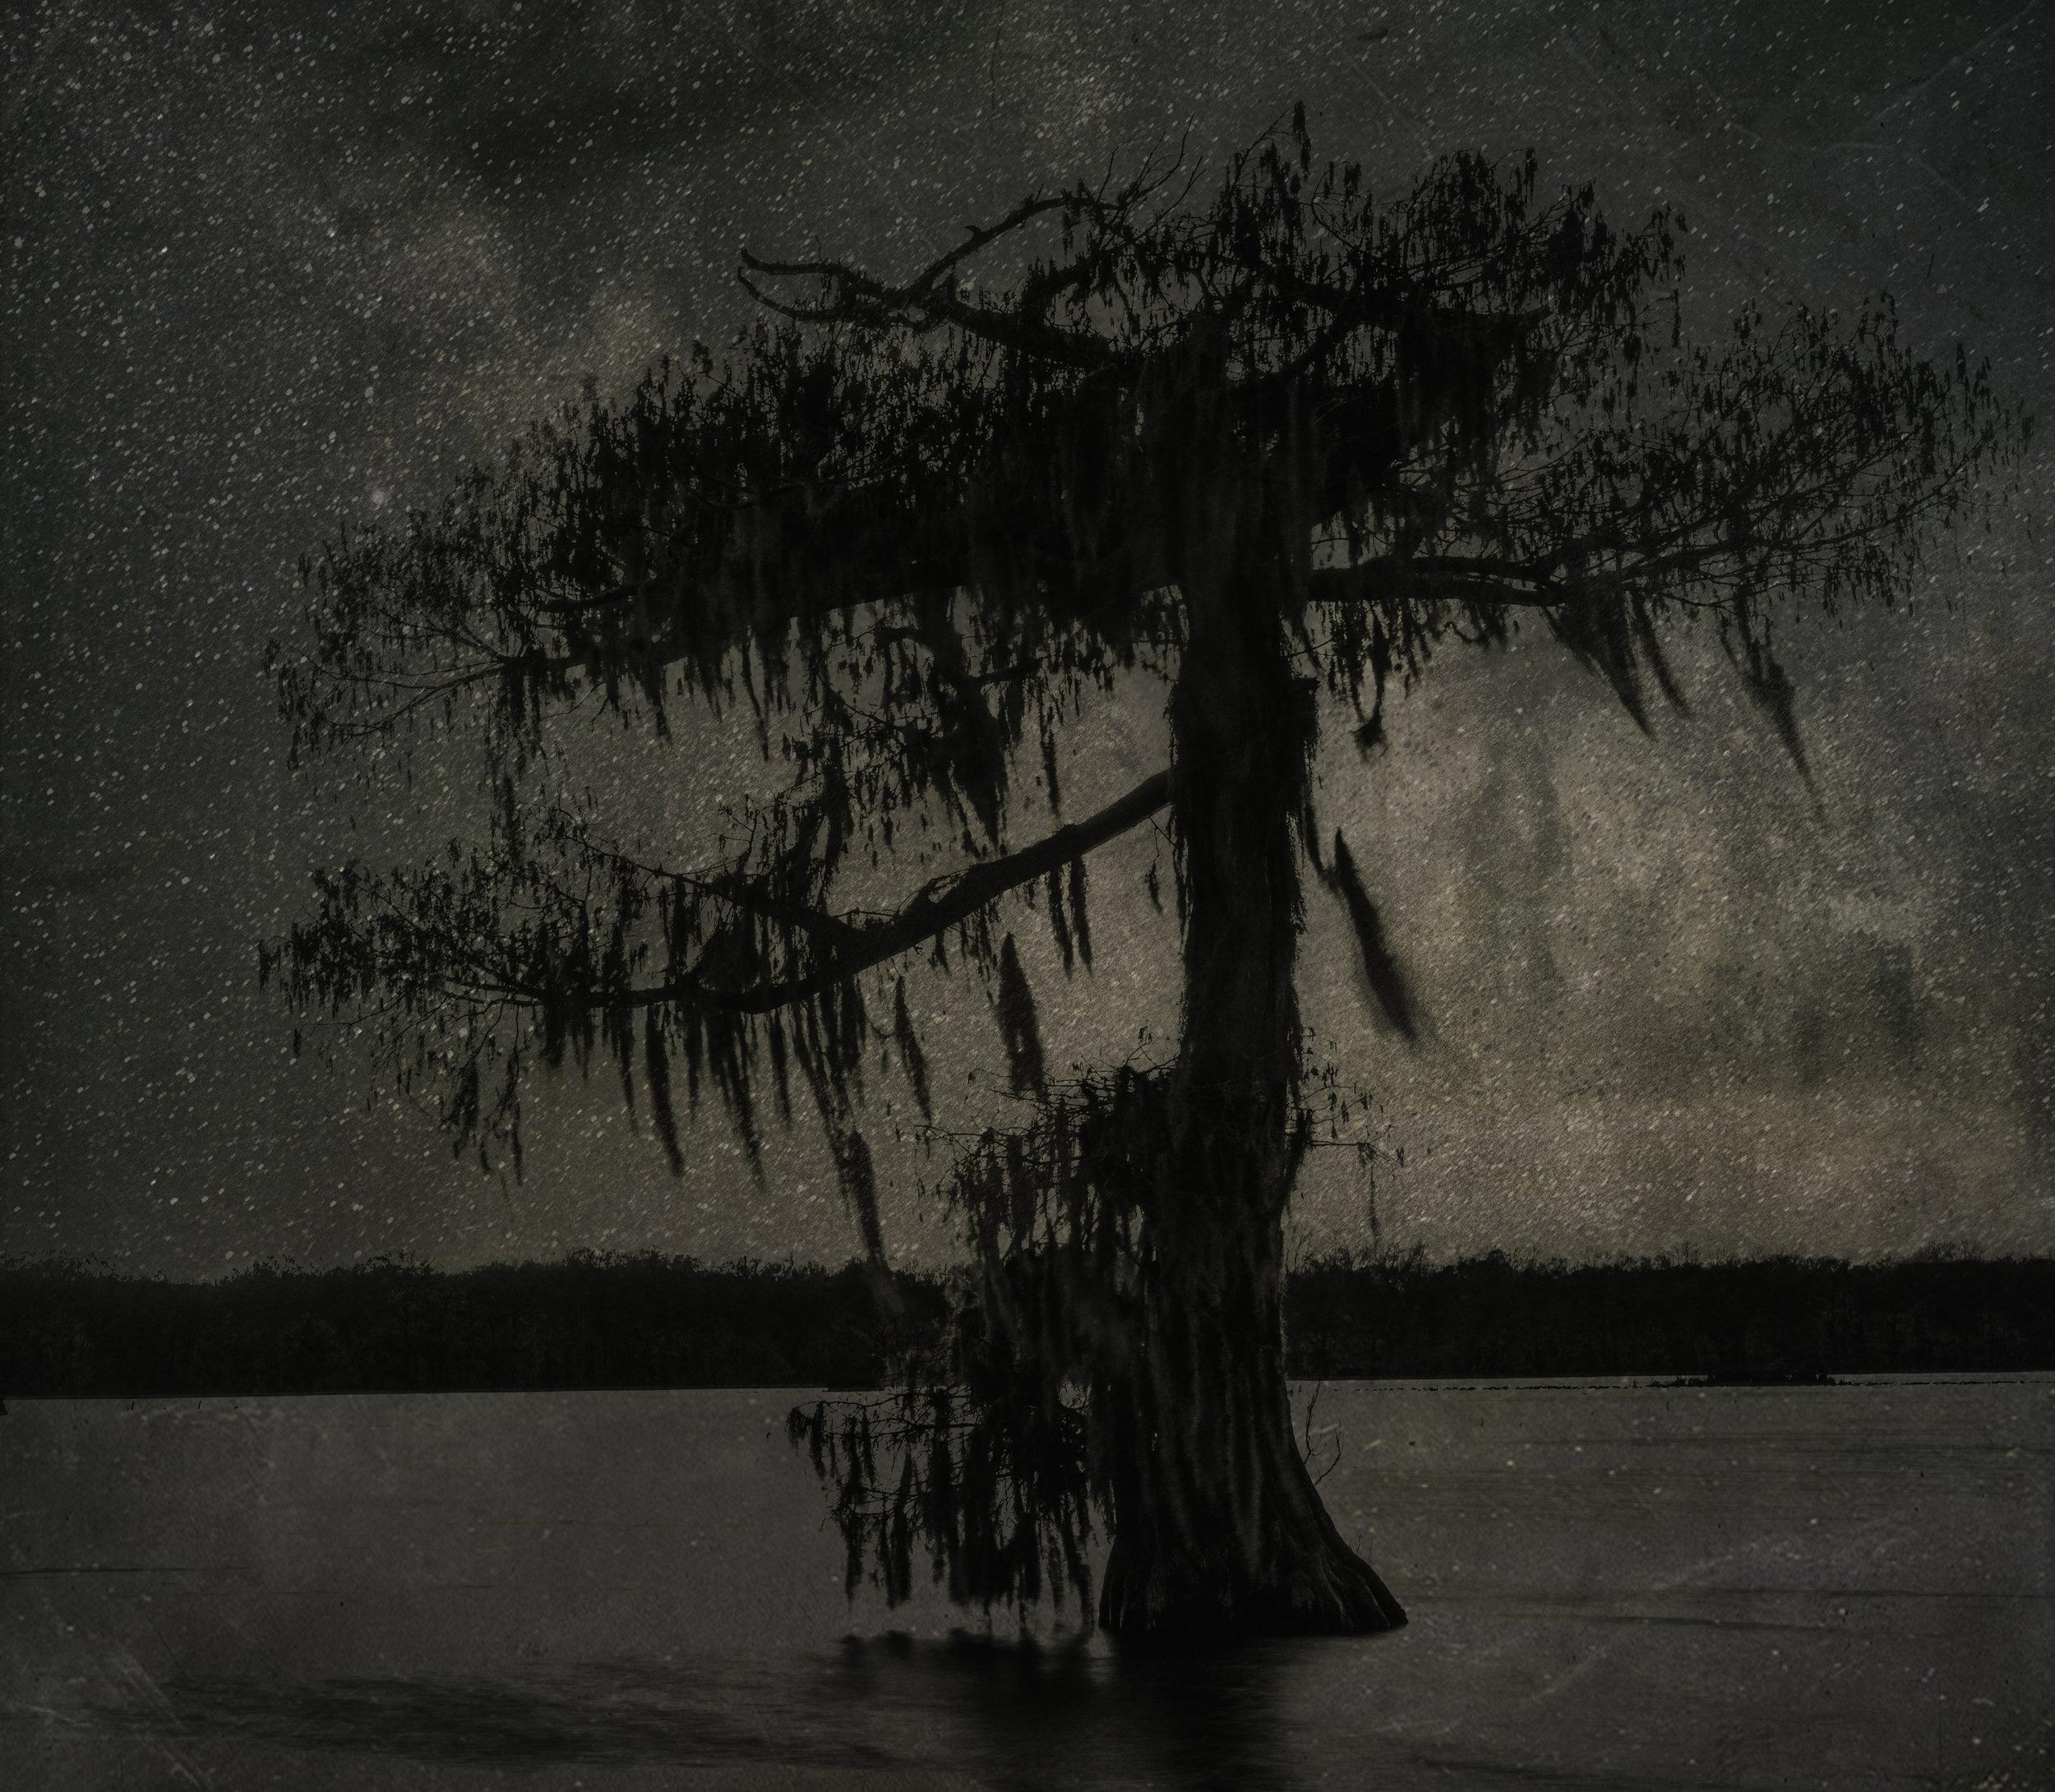 trees with stars.jpg